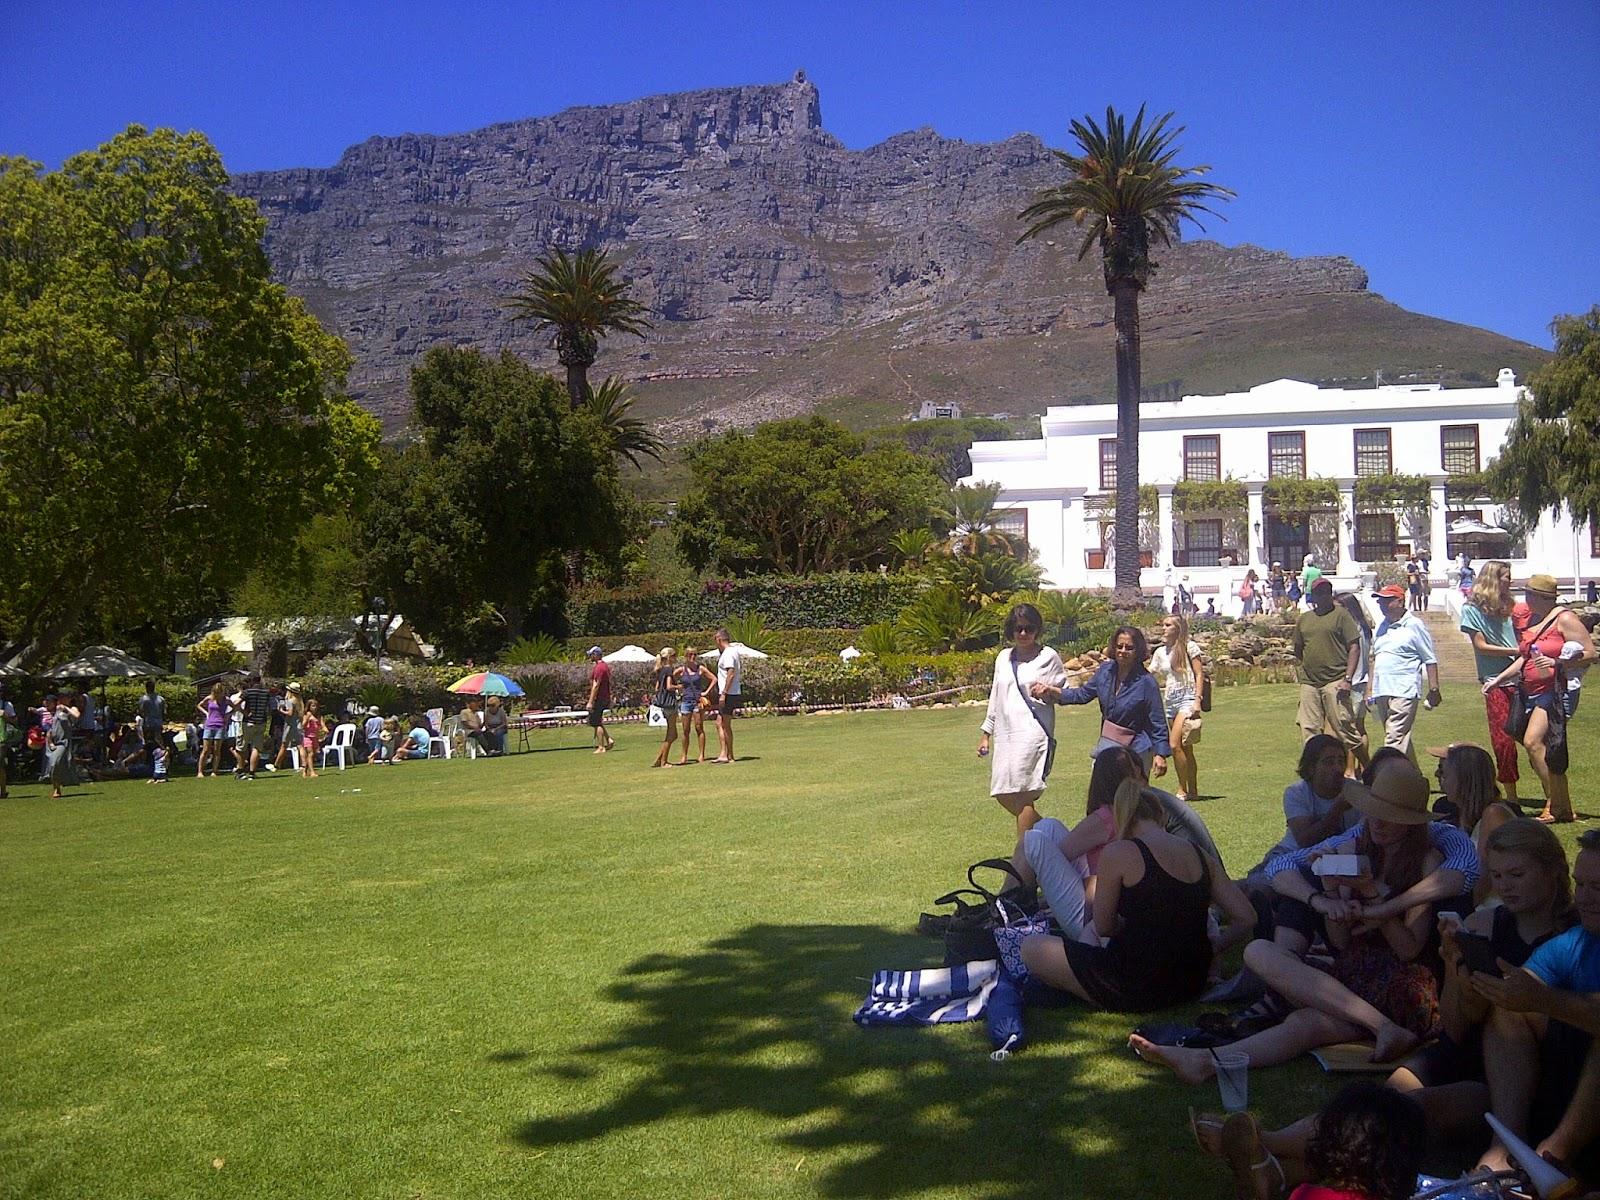 Leeuwenhof vor dem Panorama des Tafelberg